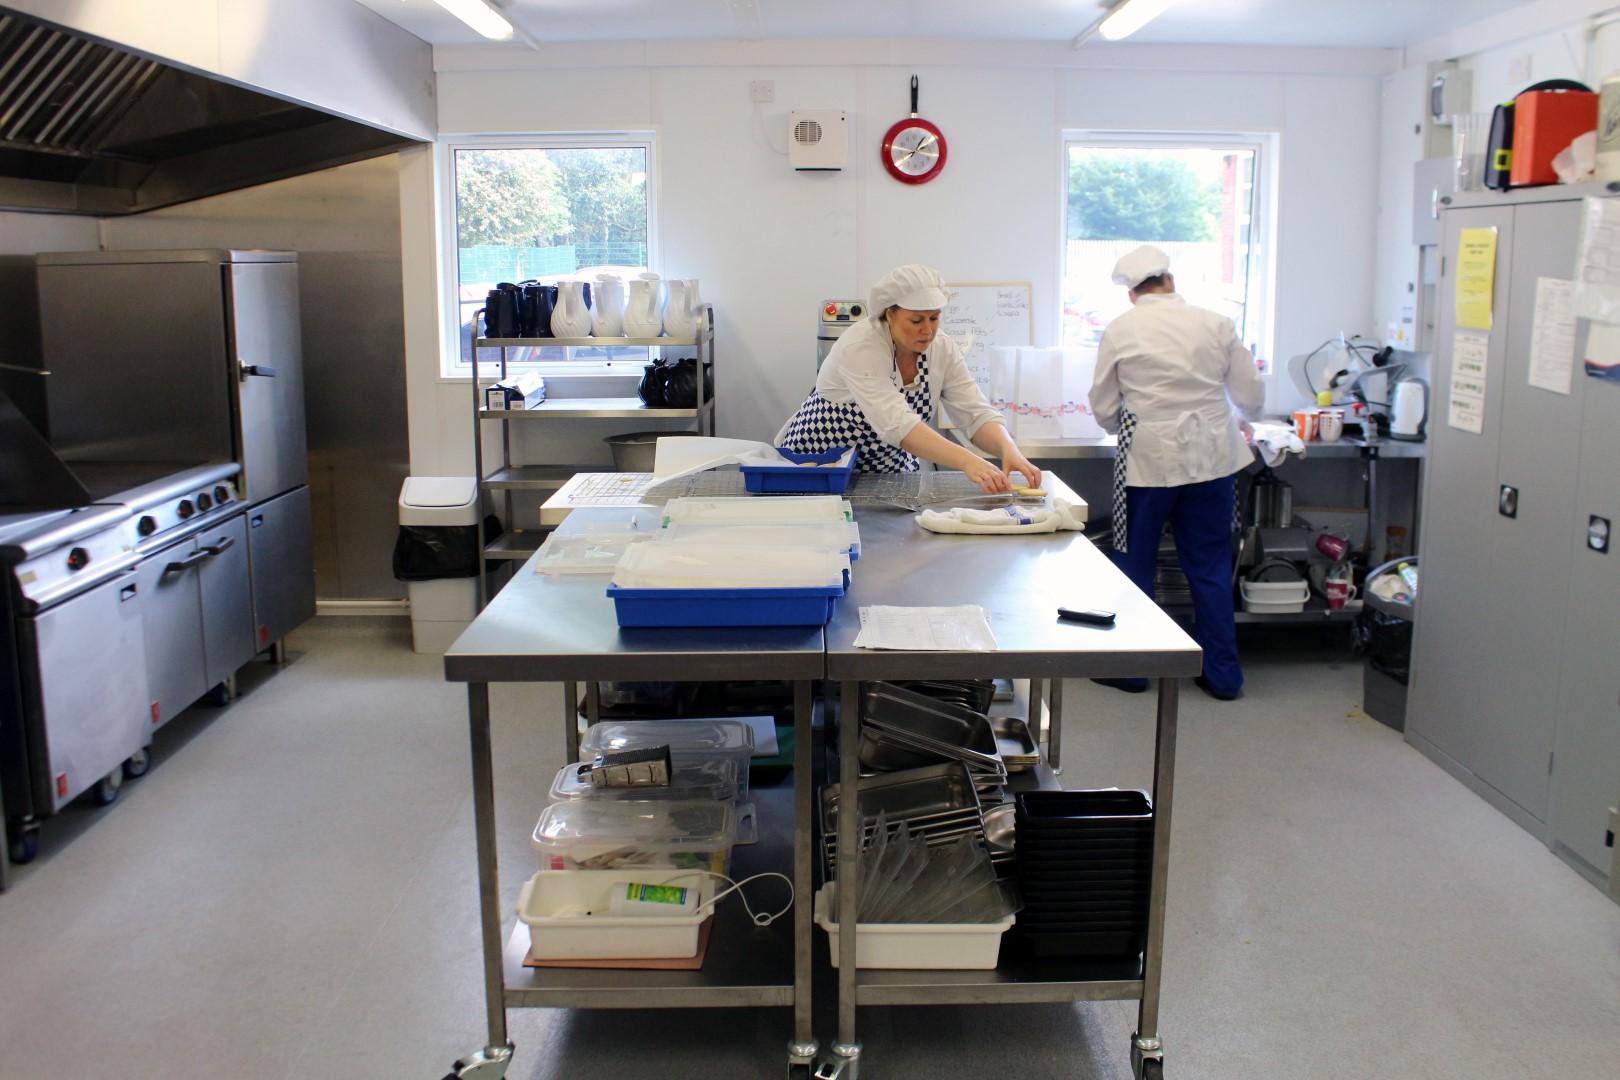 KitchenPod at Bentley Road primary school